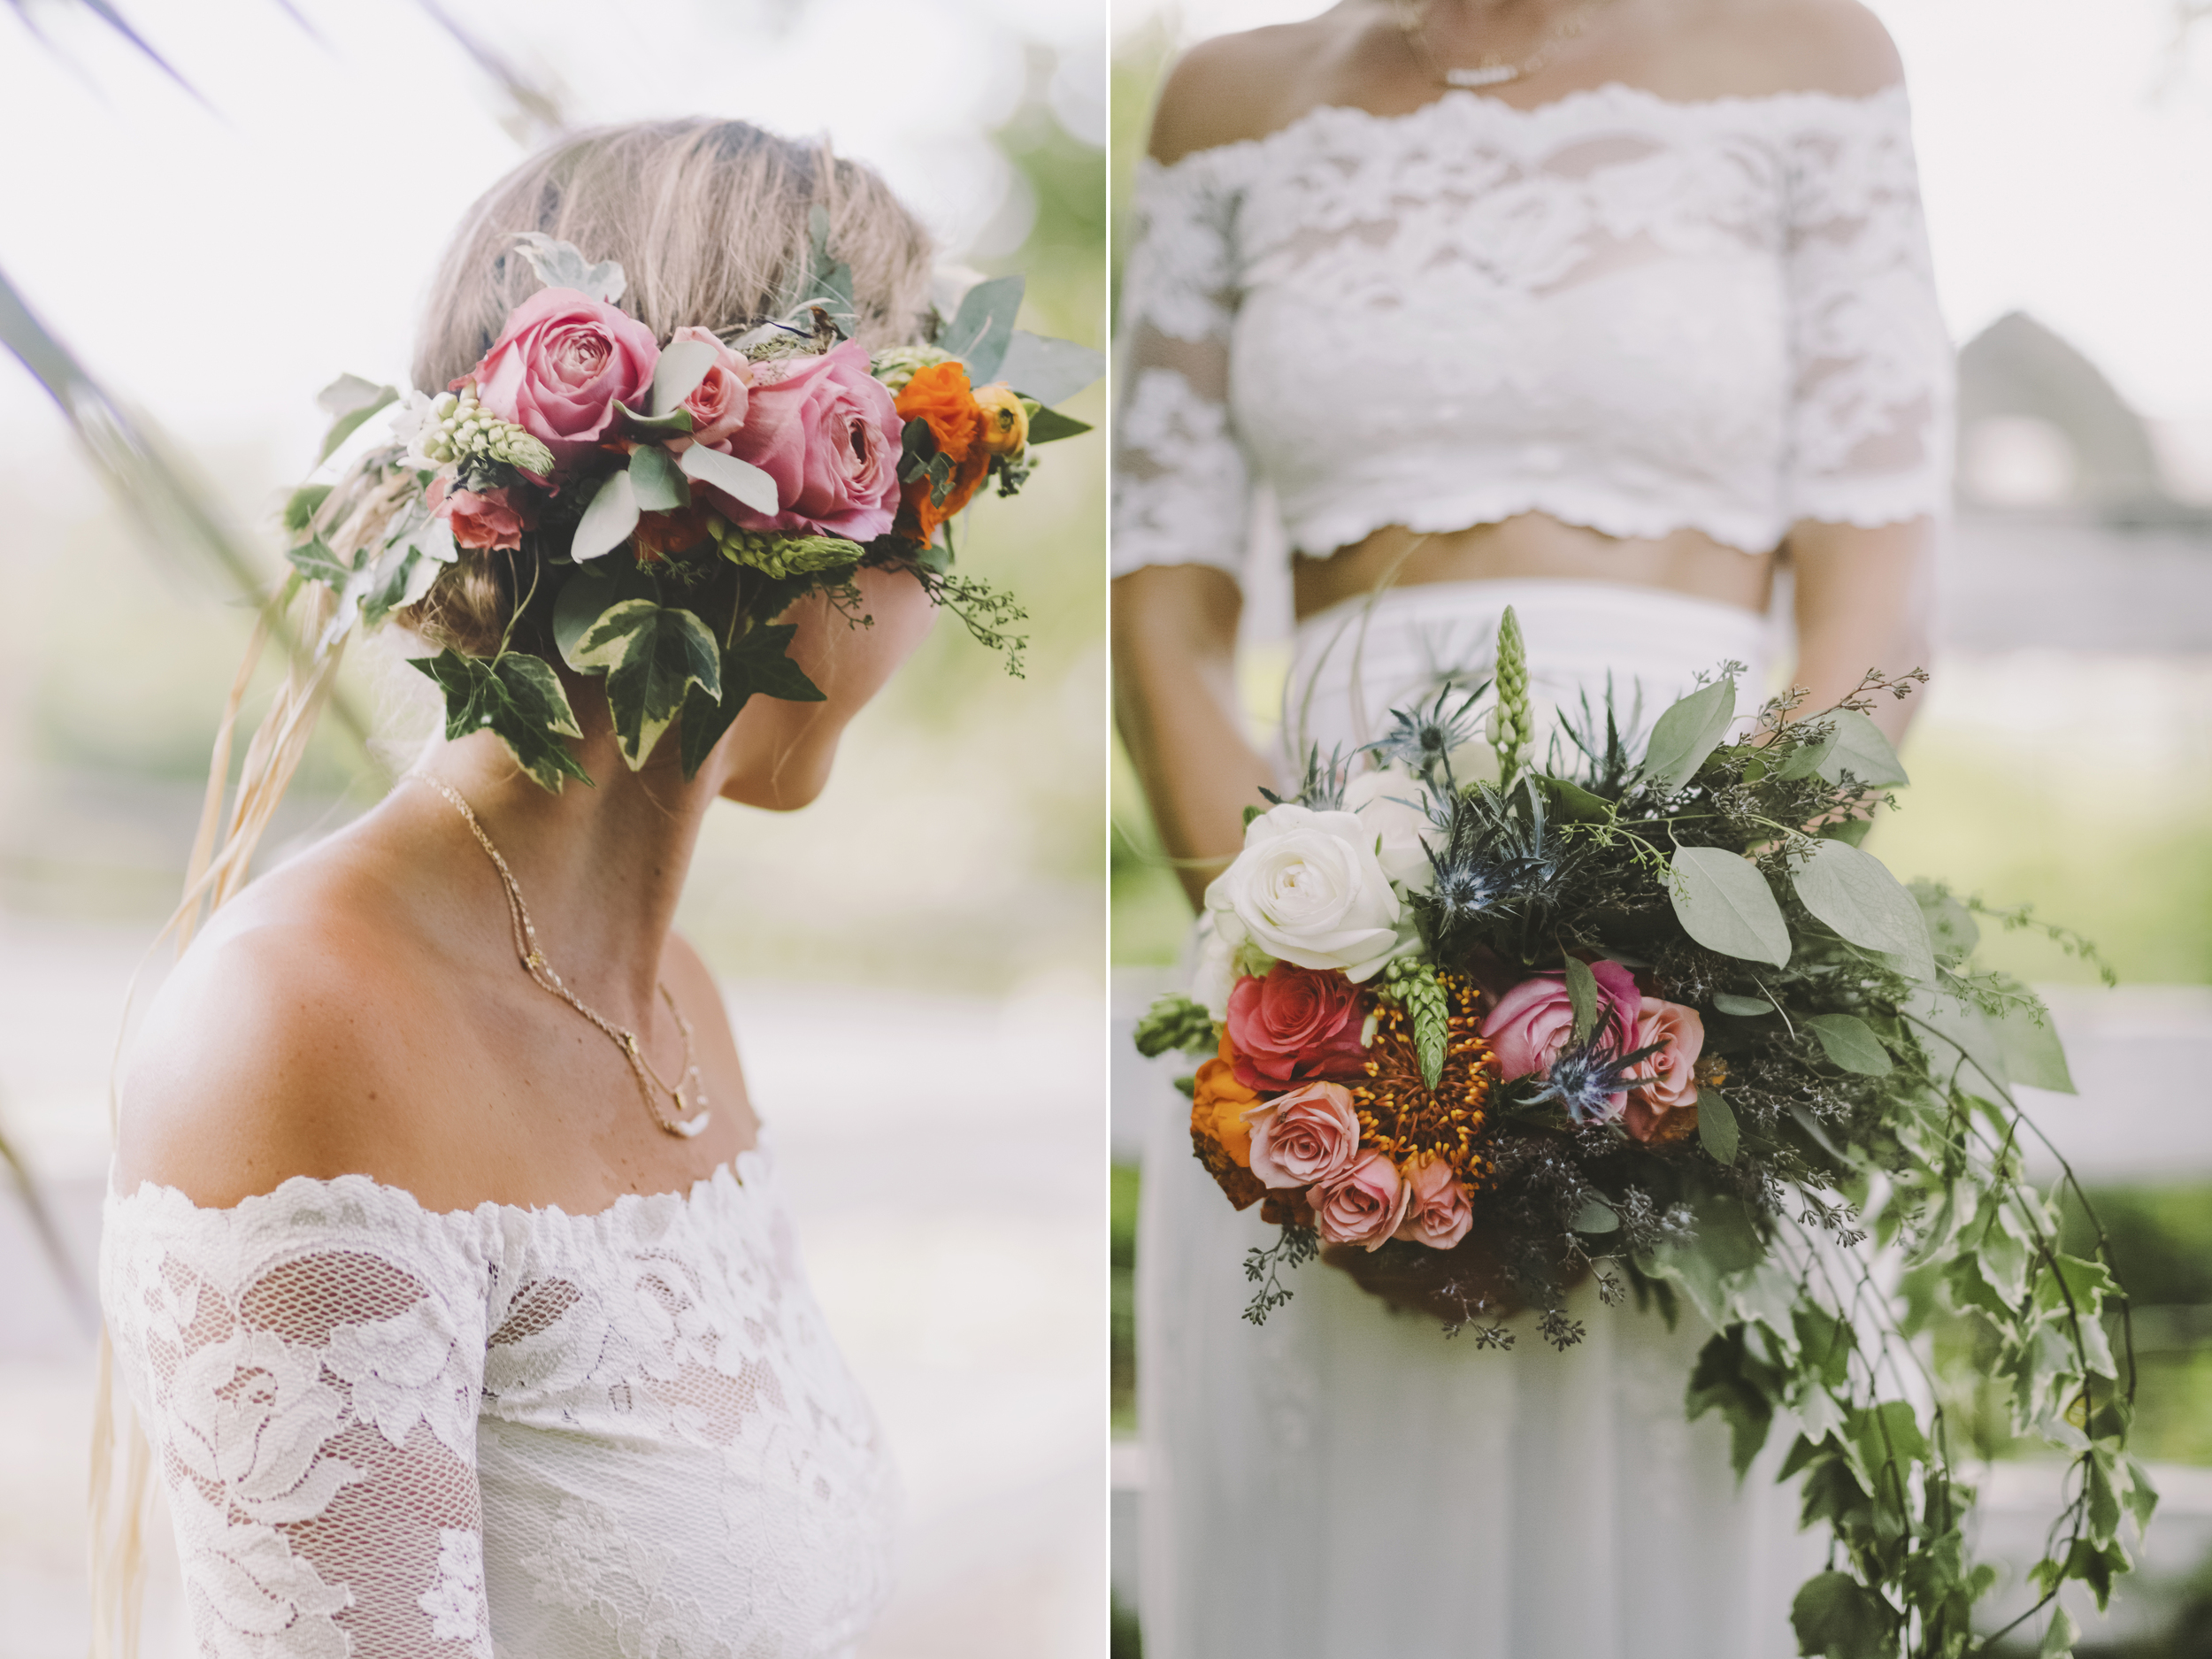 angie-diaz-photography-oahu-hawaii-wedding-tradewinds-ranch-83.jpg